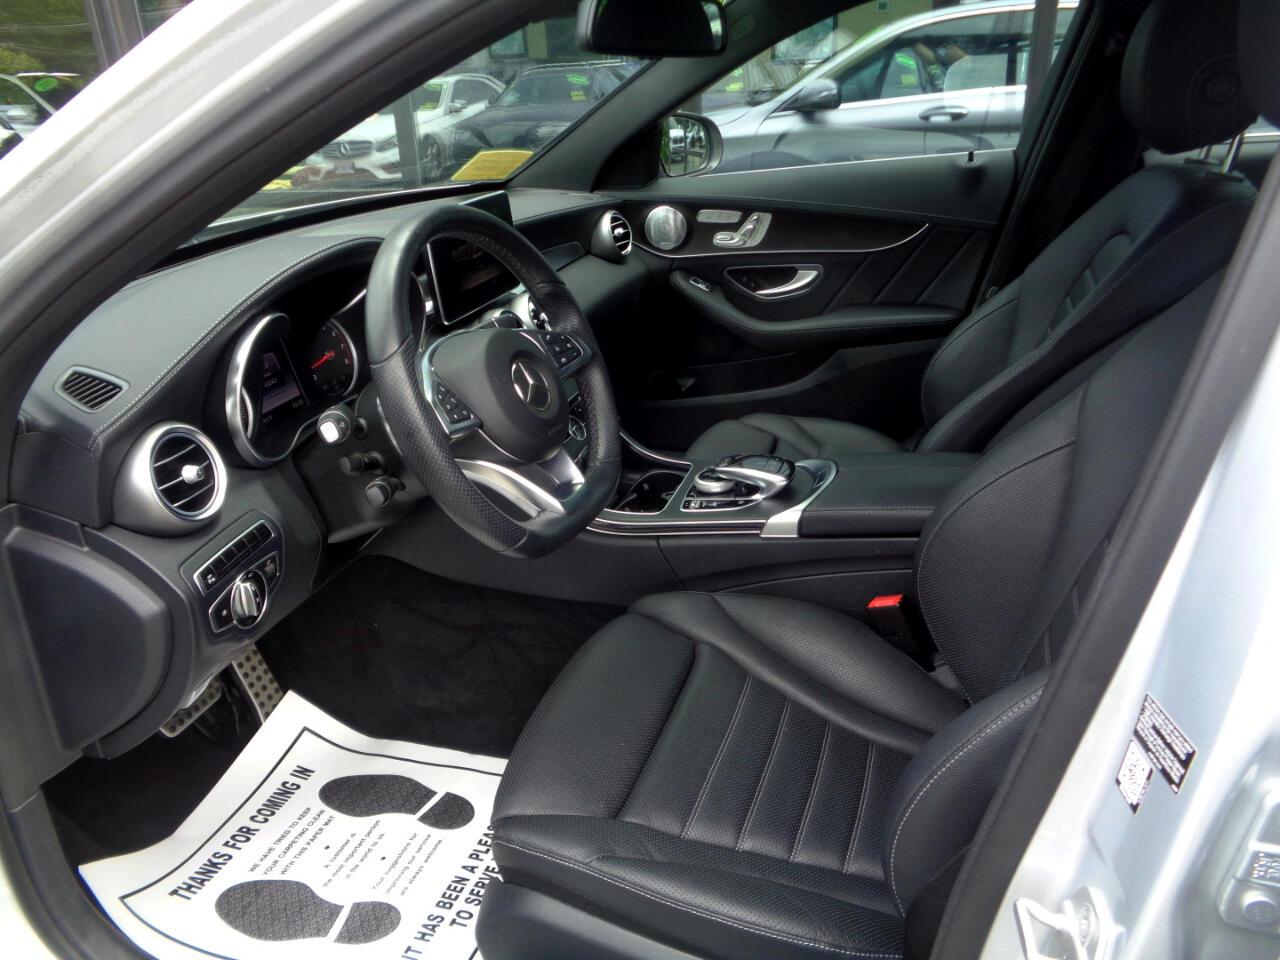 Mercedes-Benz C-Class 4dr Sdn C 400 4MATIC 2015